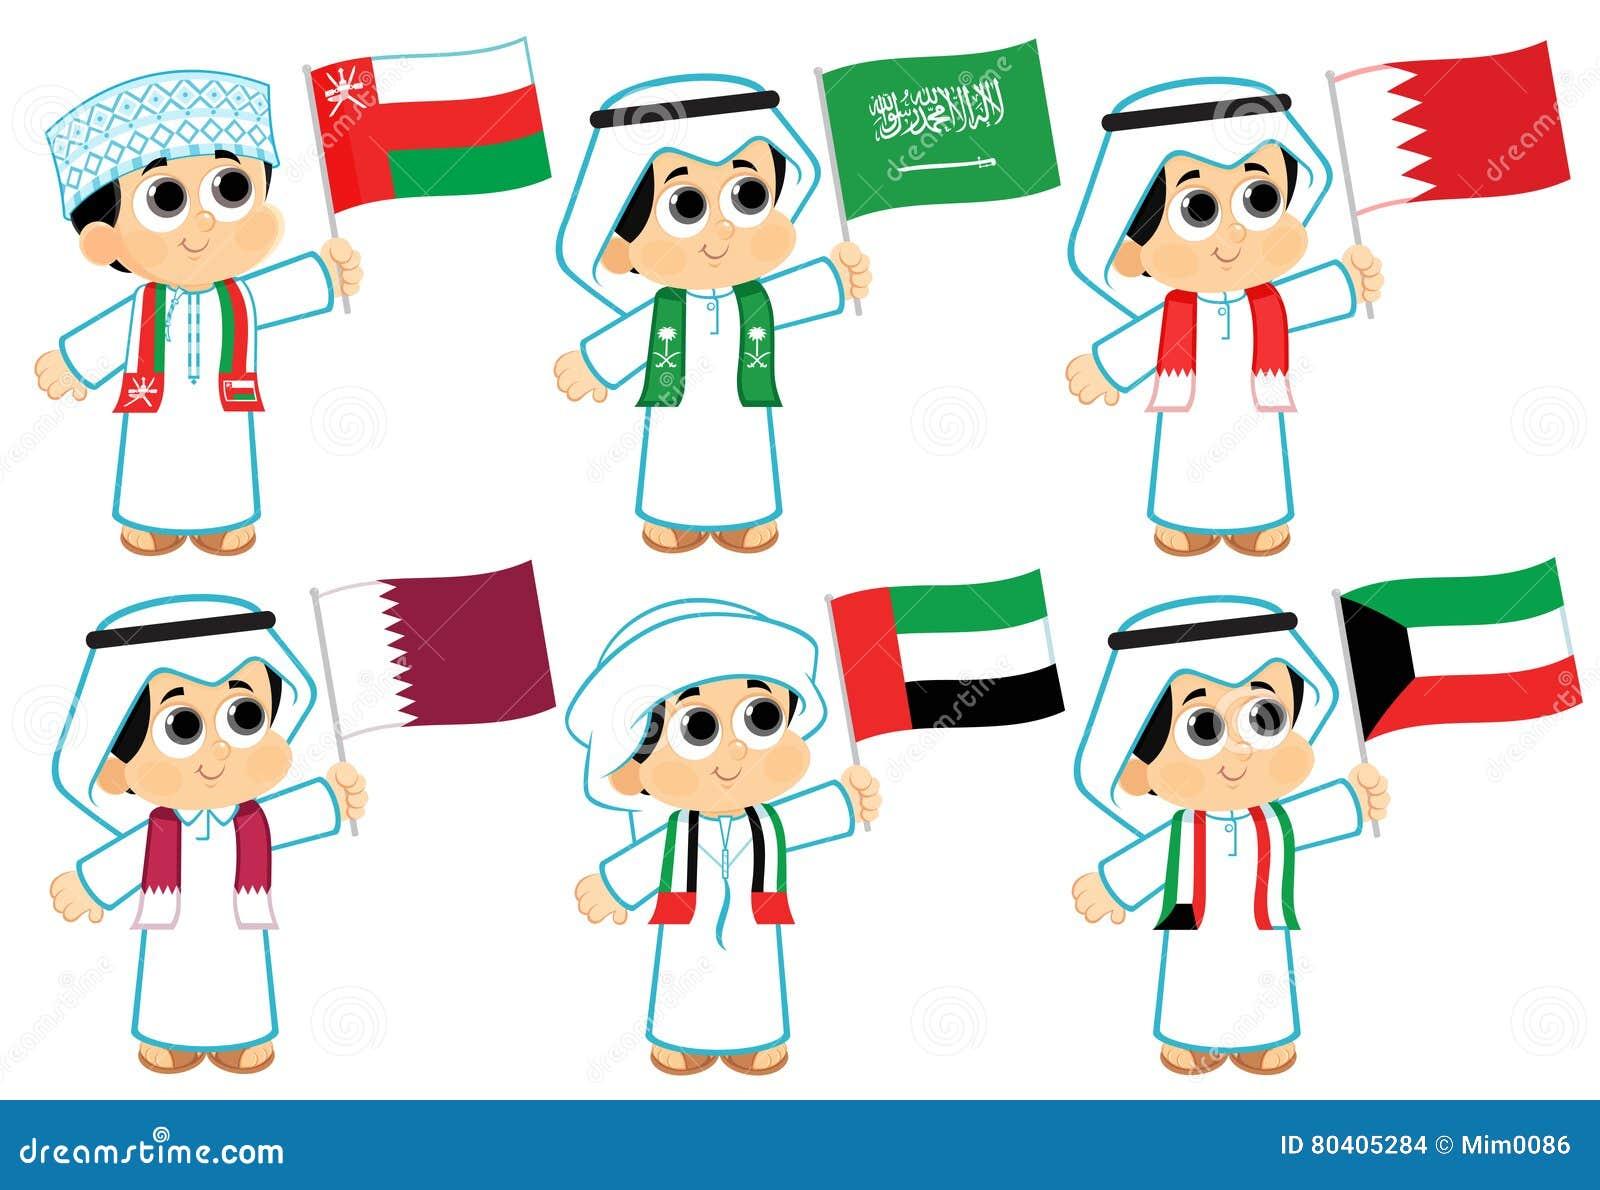 Gulf Cooperation Council Flags Oman Saudi Arabia Bahrain Qatar United Arab Emirates Kuwait Uae Flag Day Boy